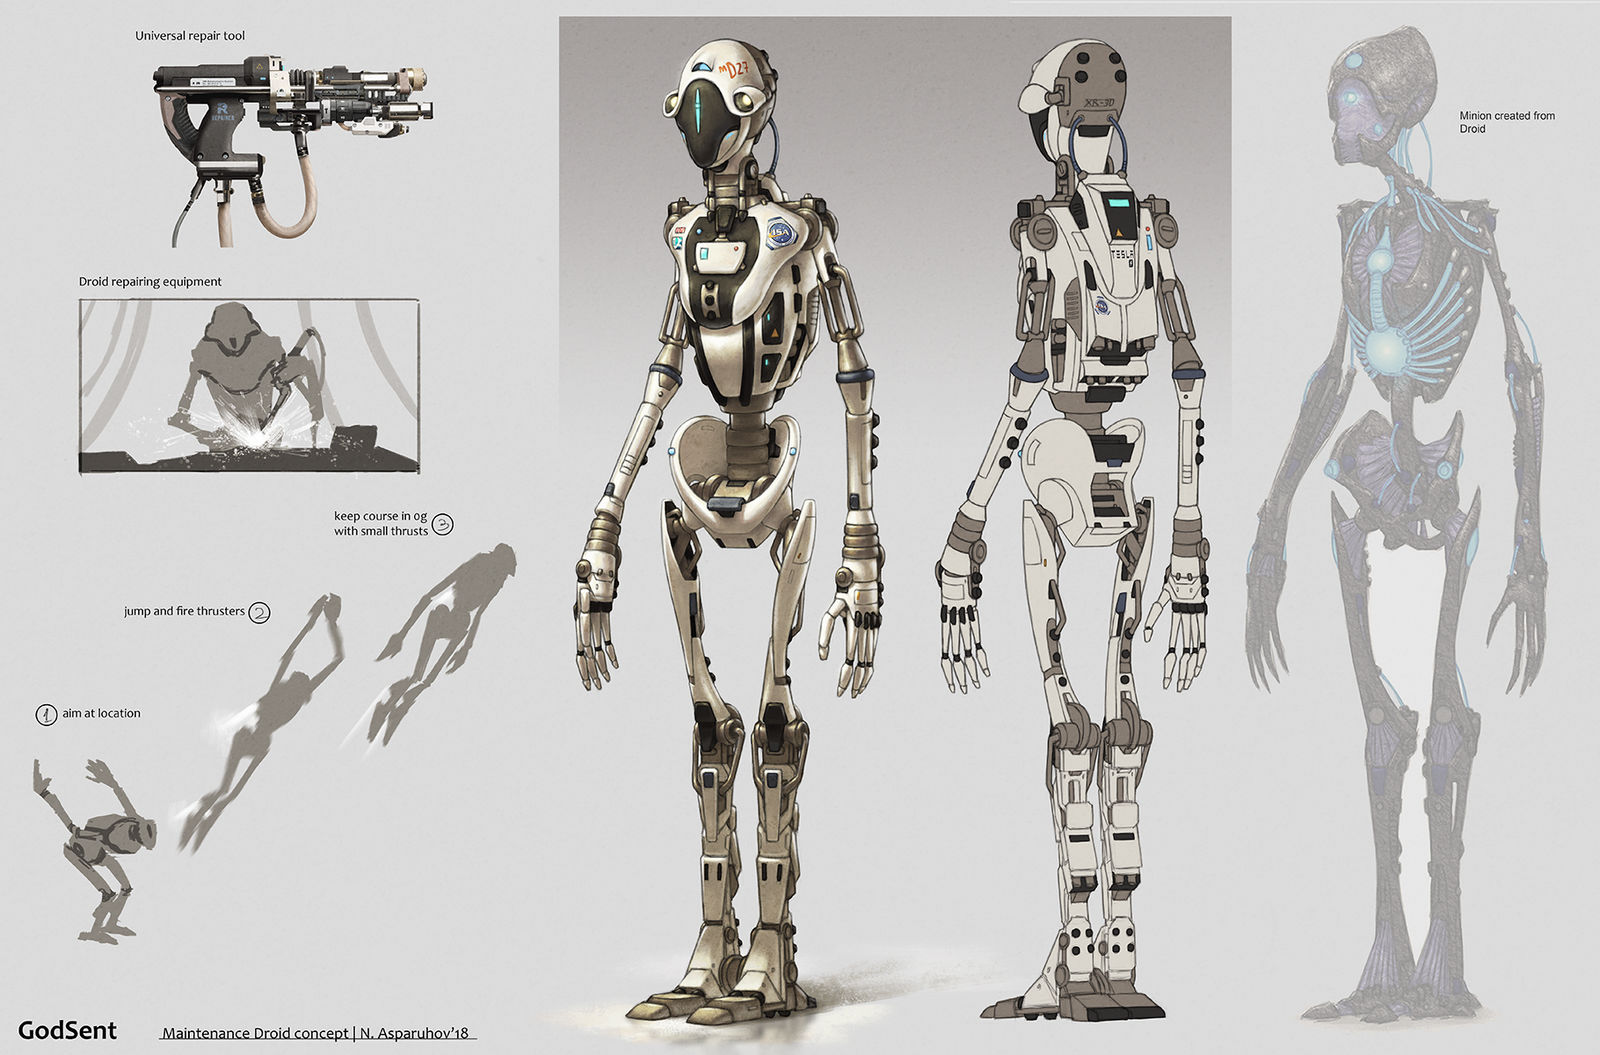 Maintenance droid concept by NikolayAsparuhov